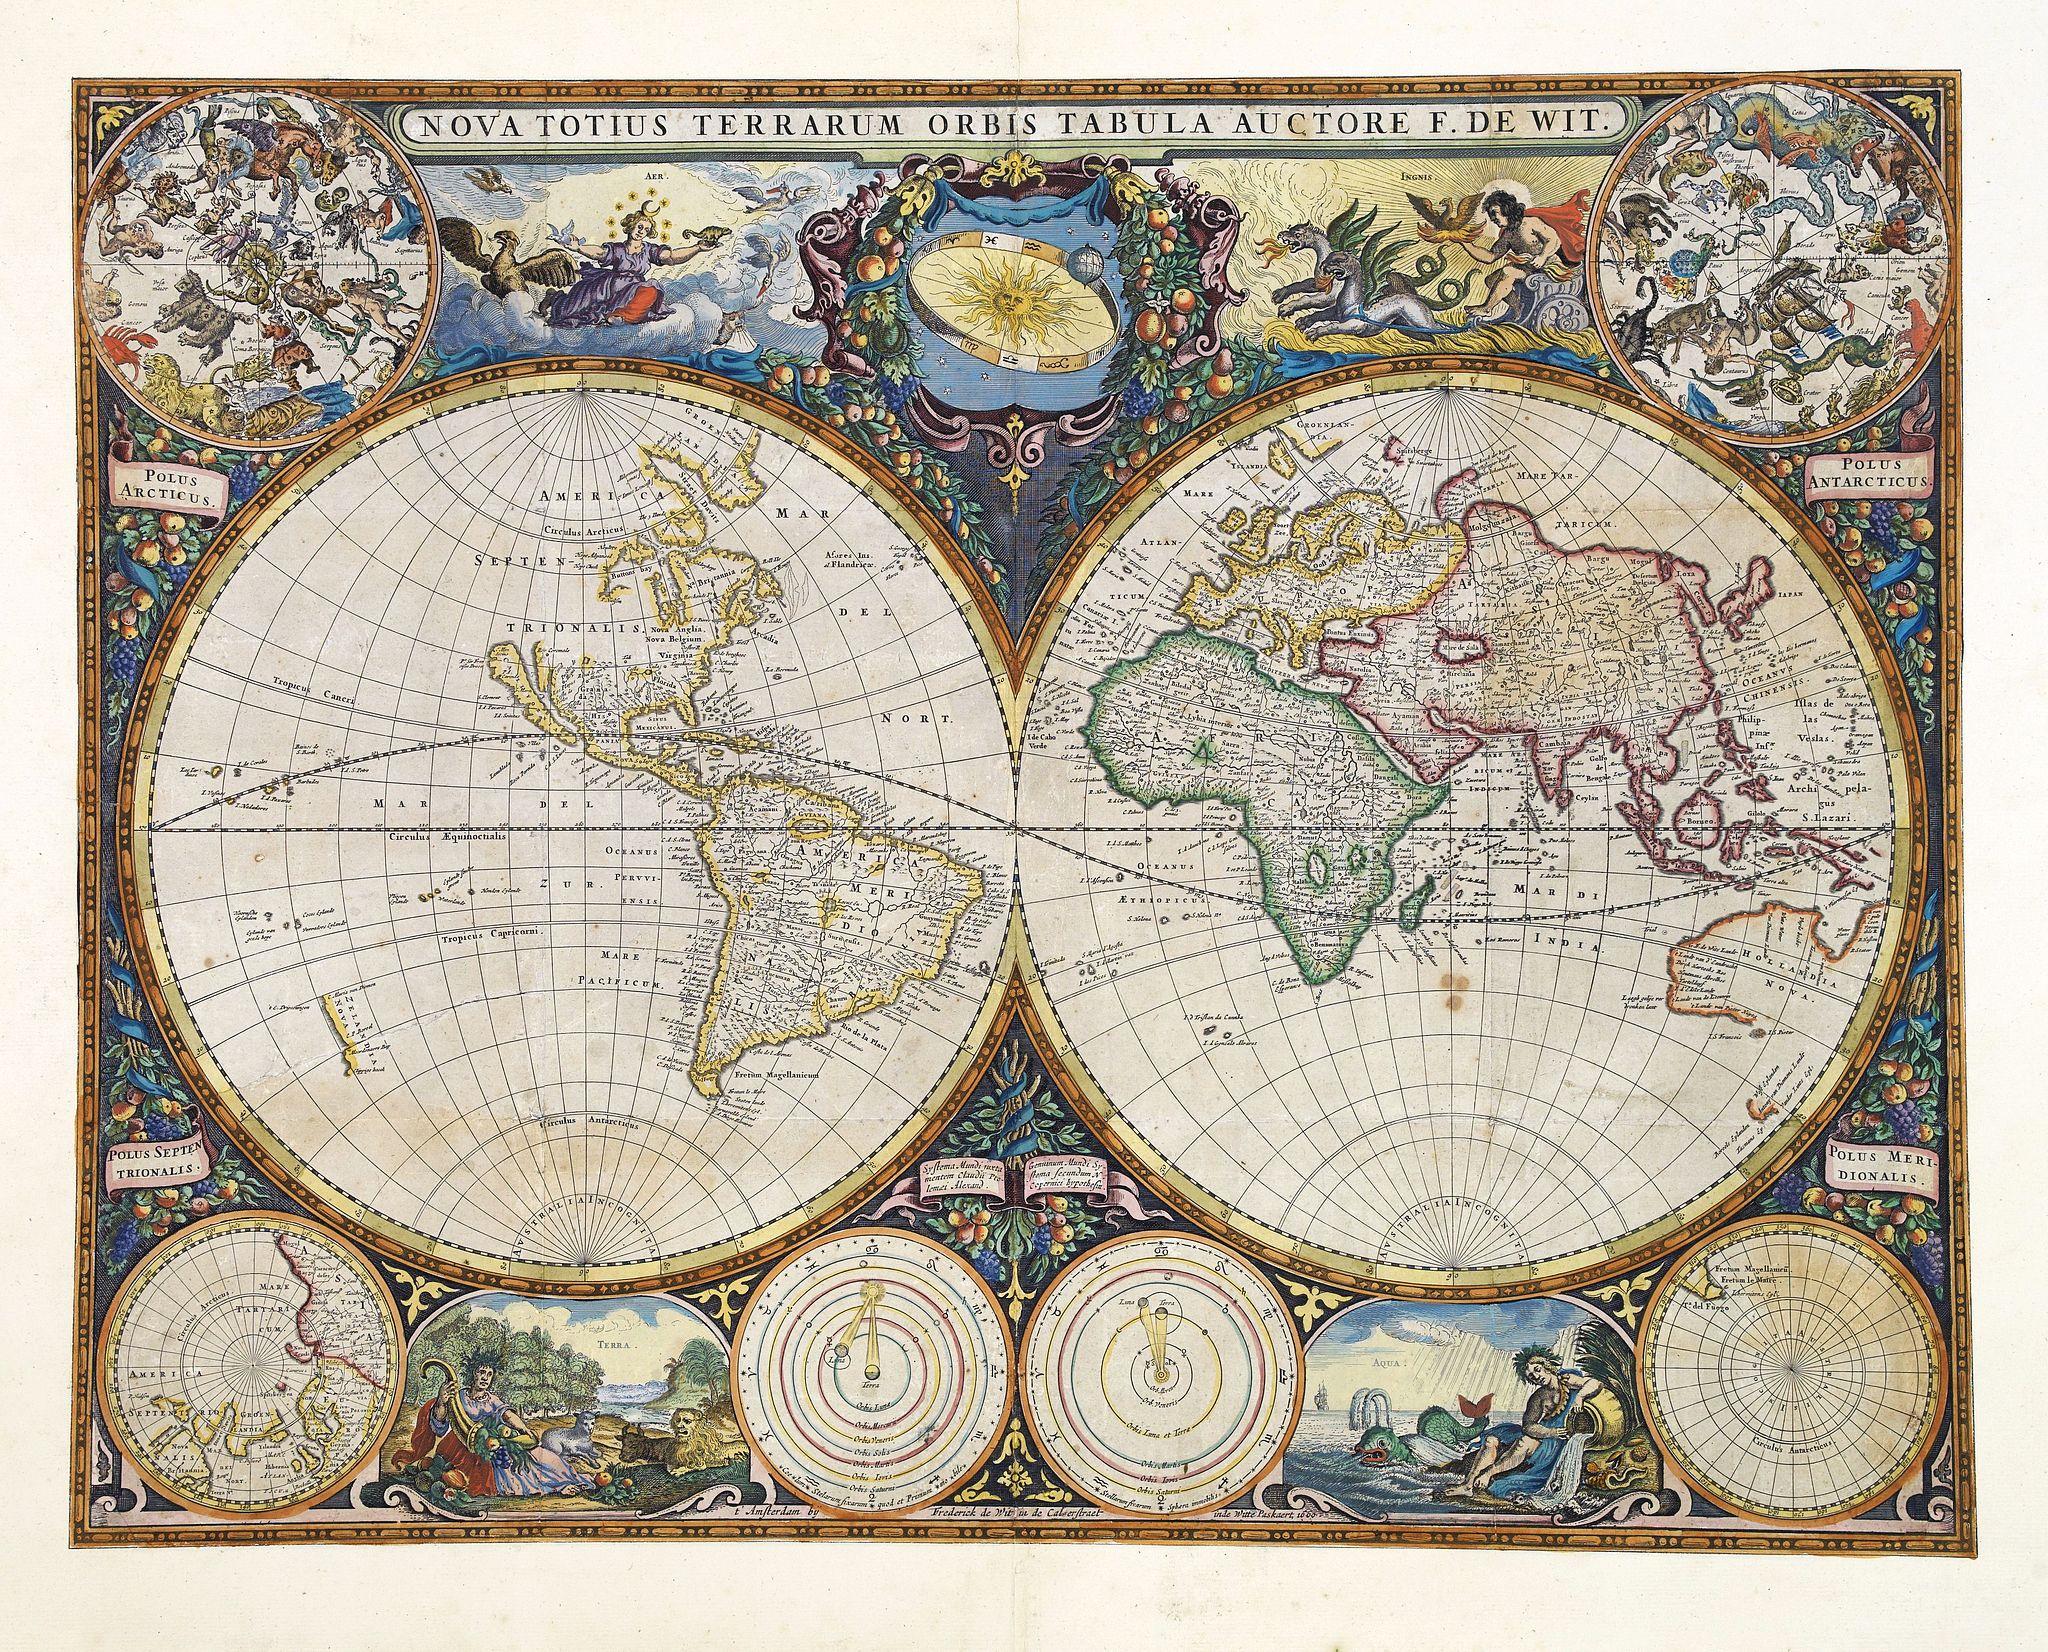 DE WIT, F. - Nova Totius Terrarum Orbis Tabula.